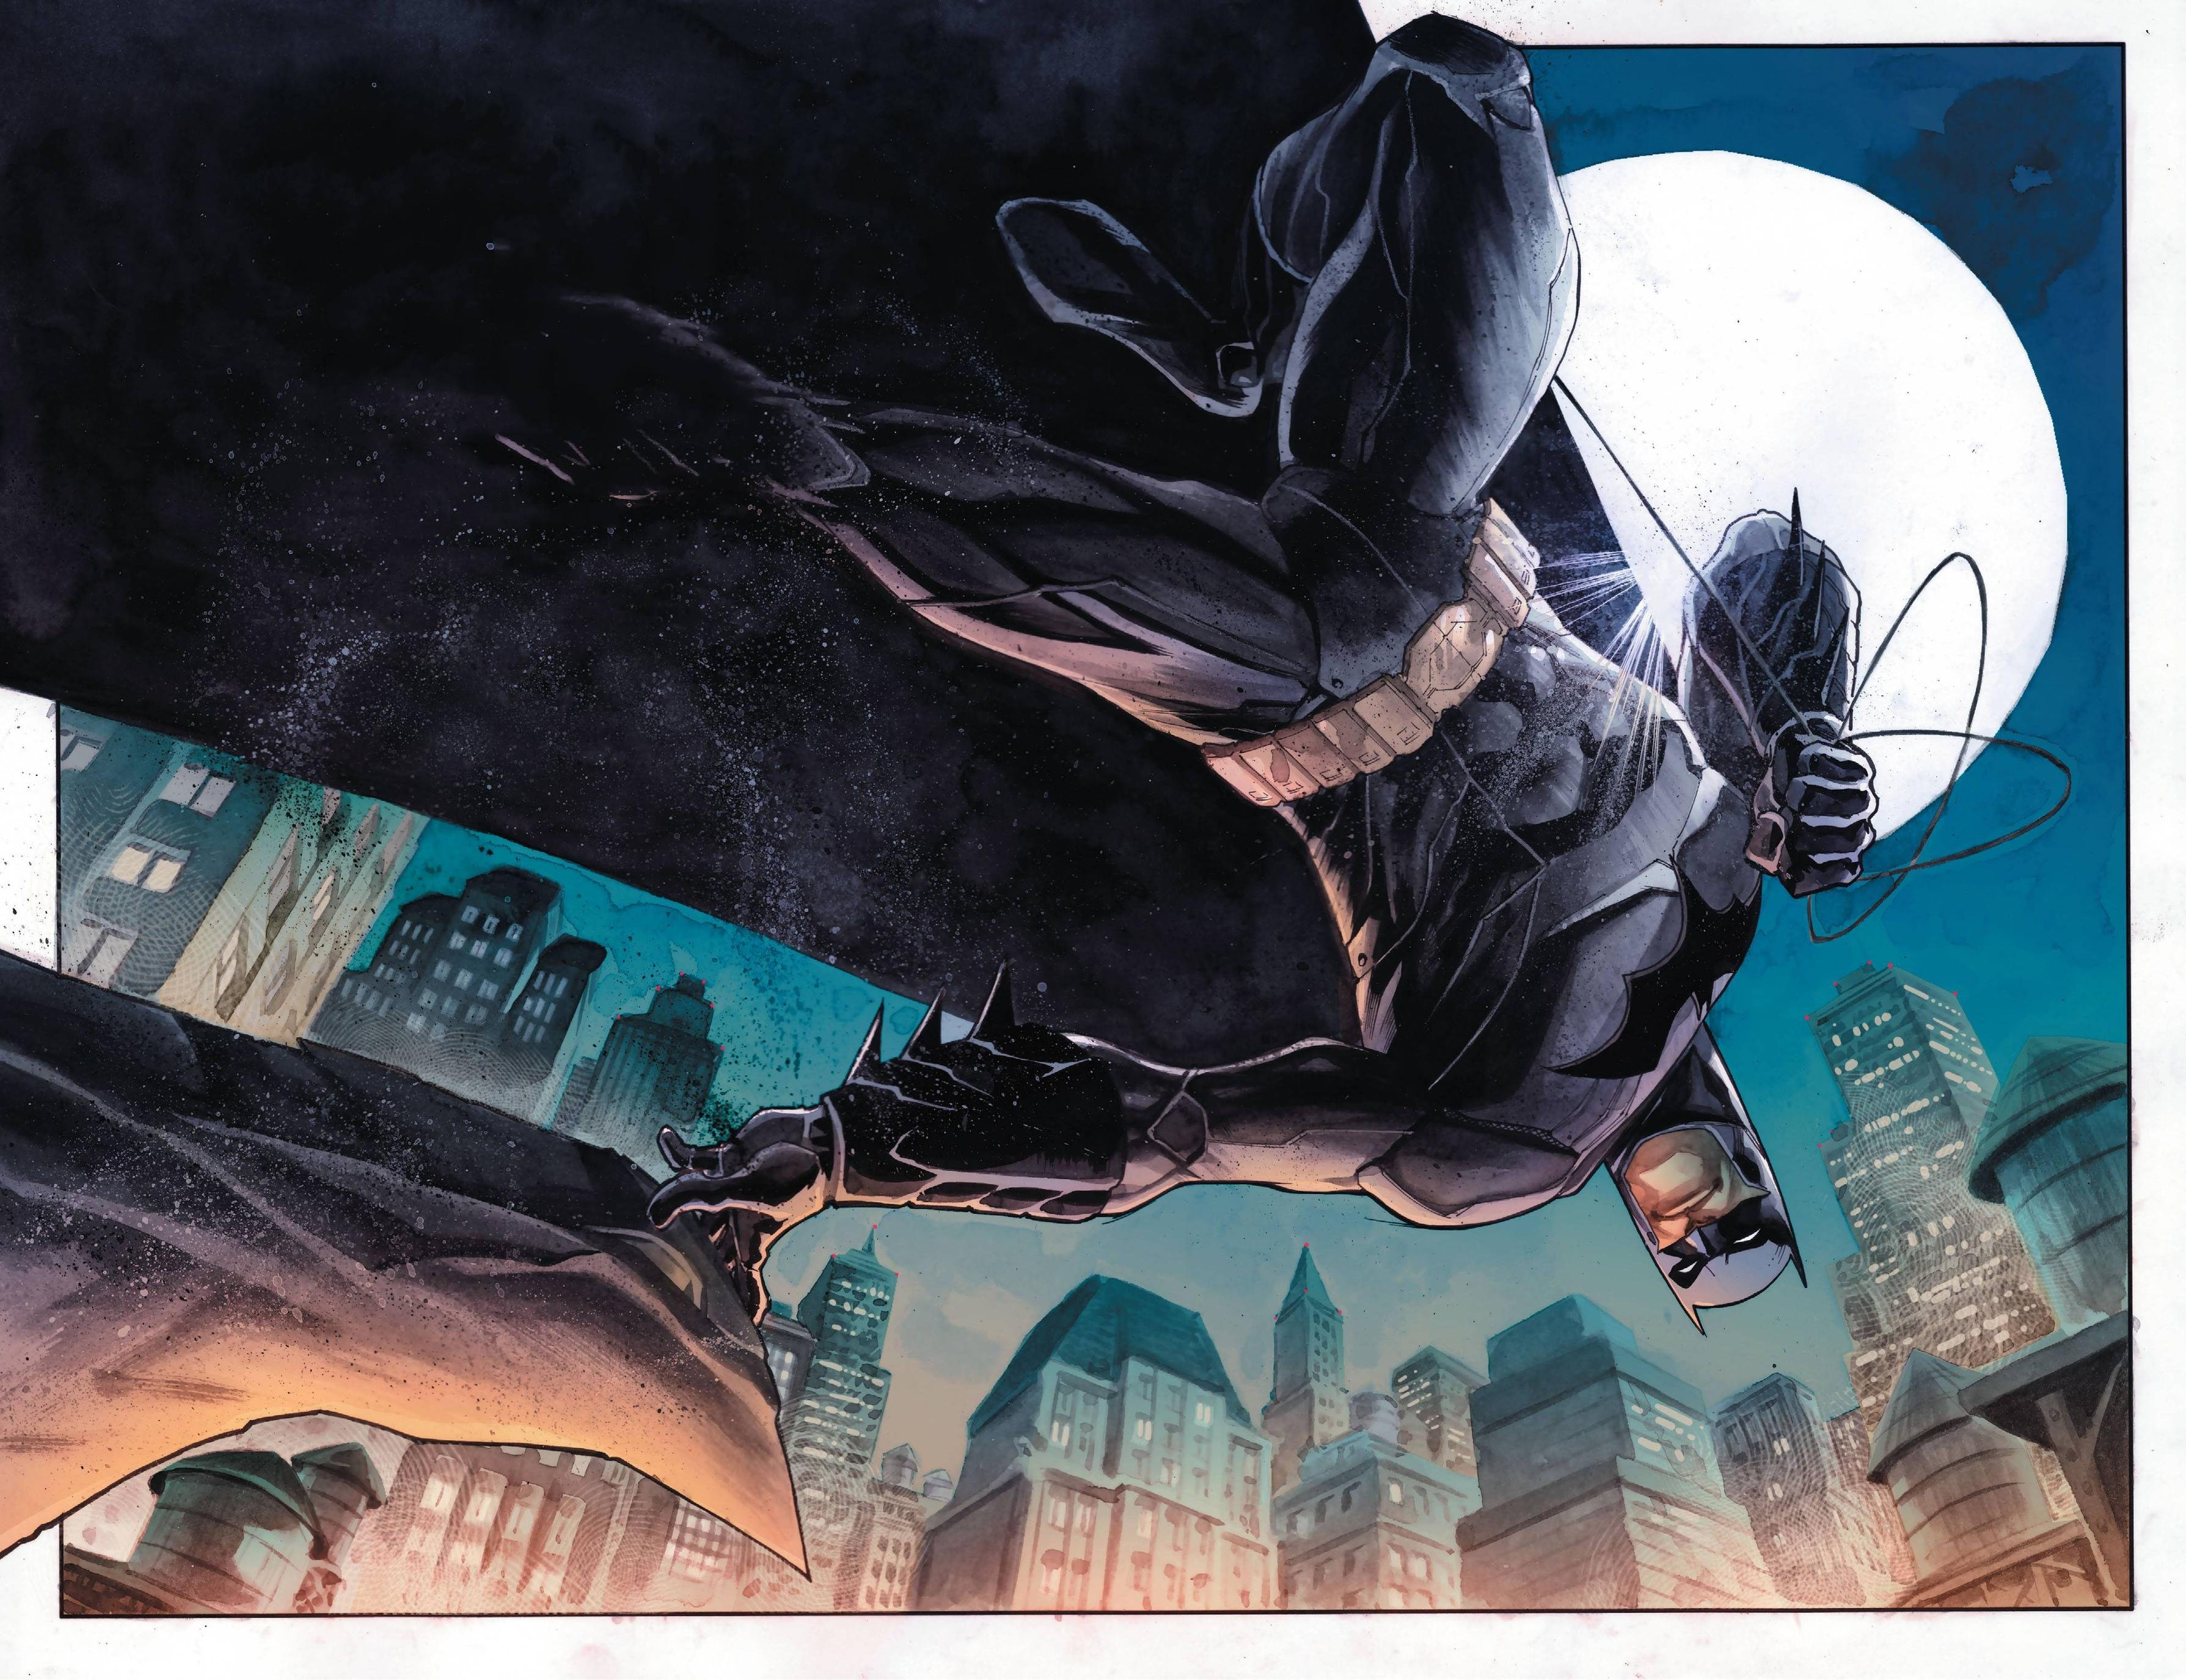 Superman Hd Wallpaper Batman Wallpapers And Desktop Backgrounds Up To 8k